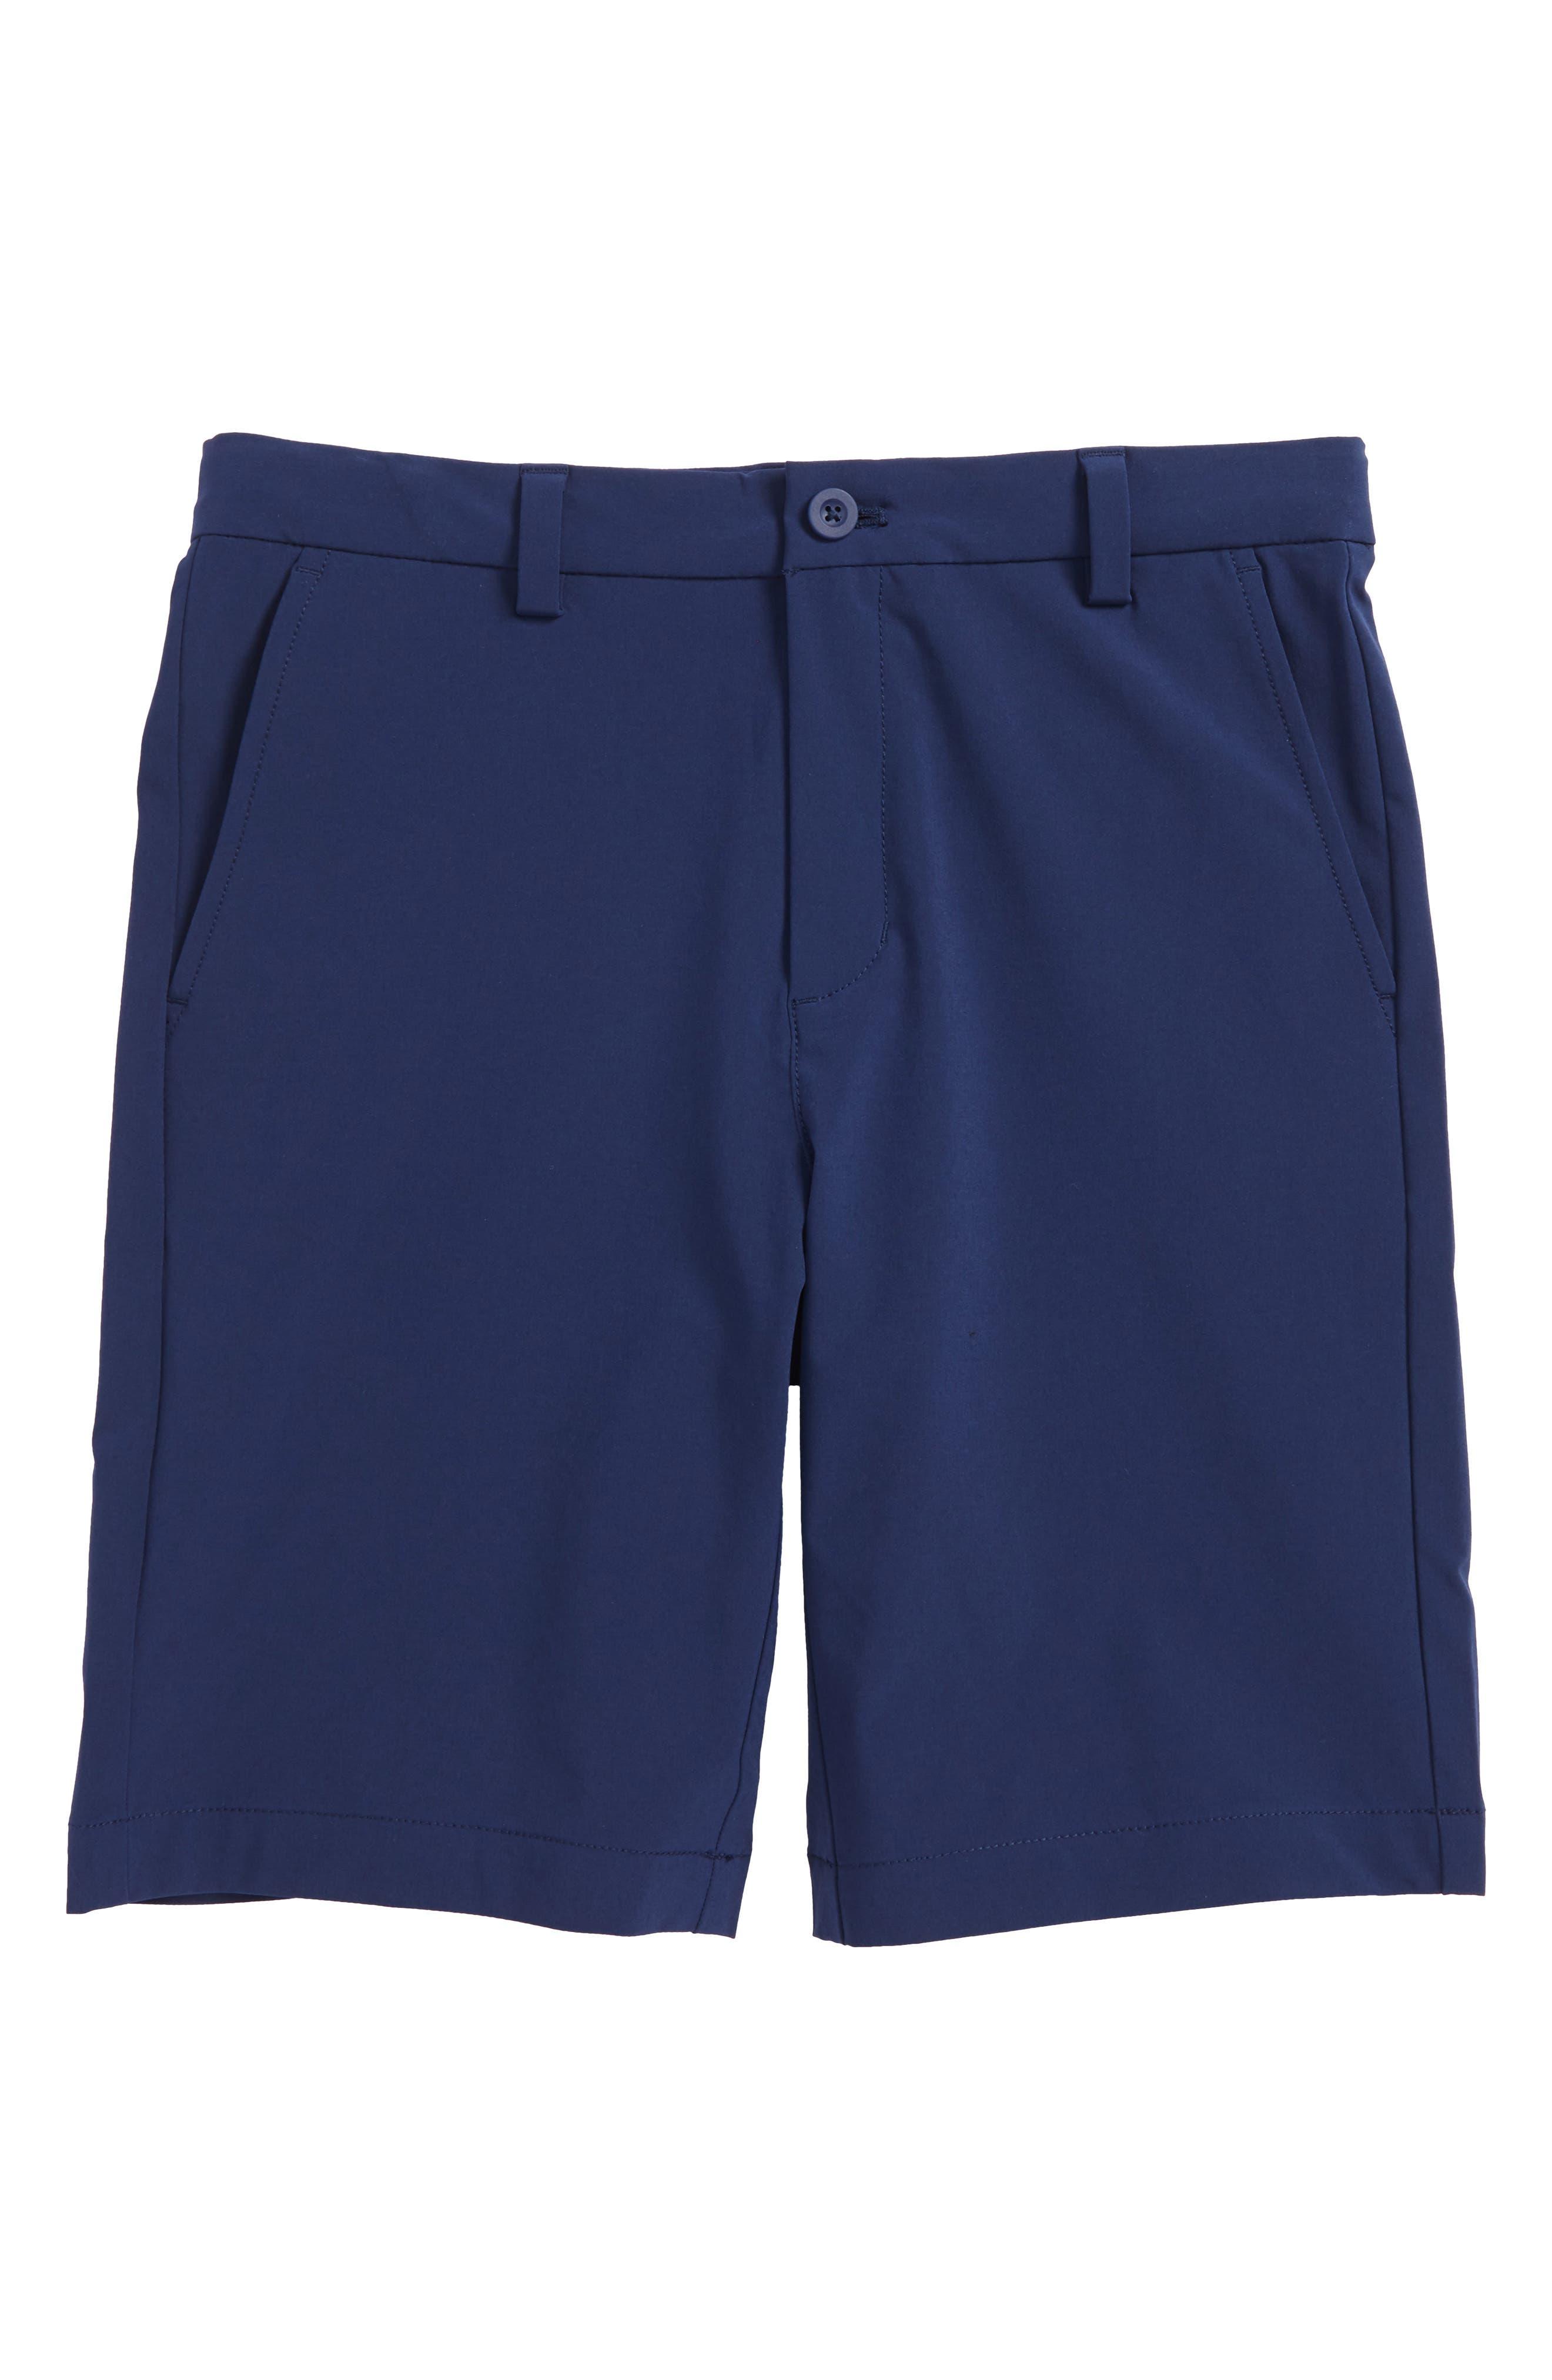 Performance Breaker Shorts,                         Main,                         color, DEEP BAY